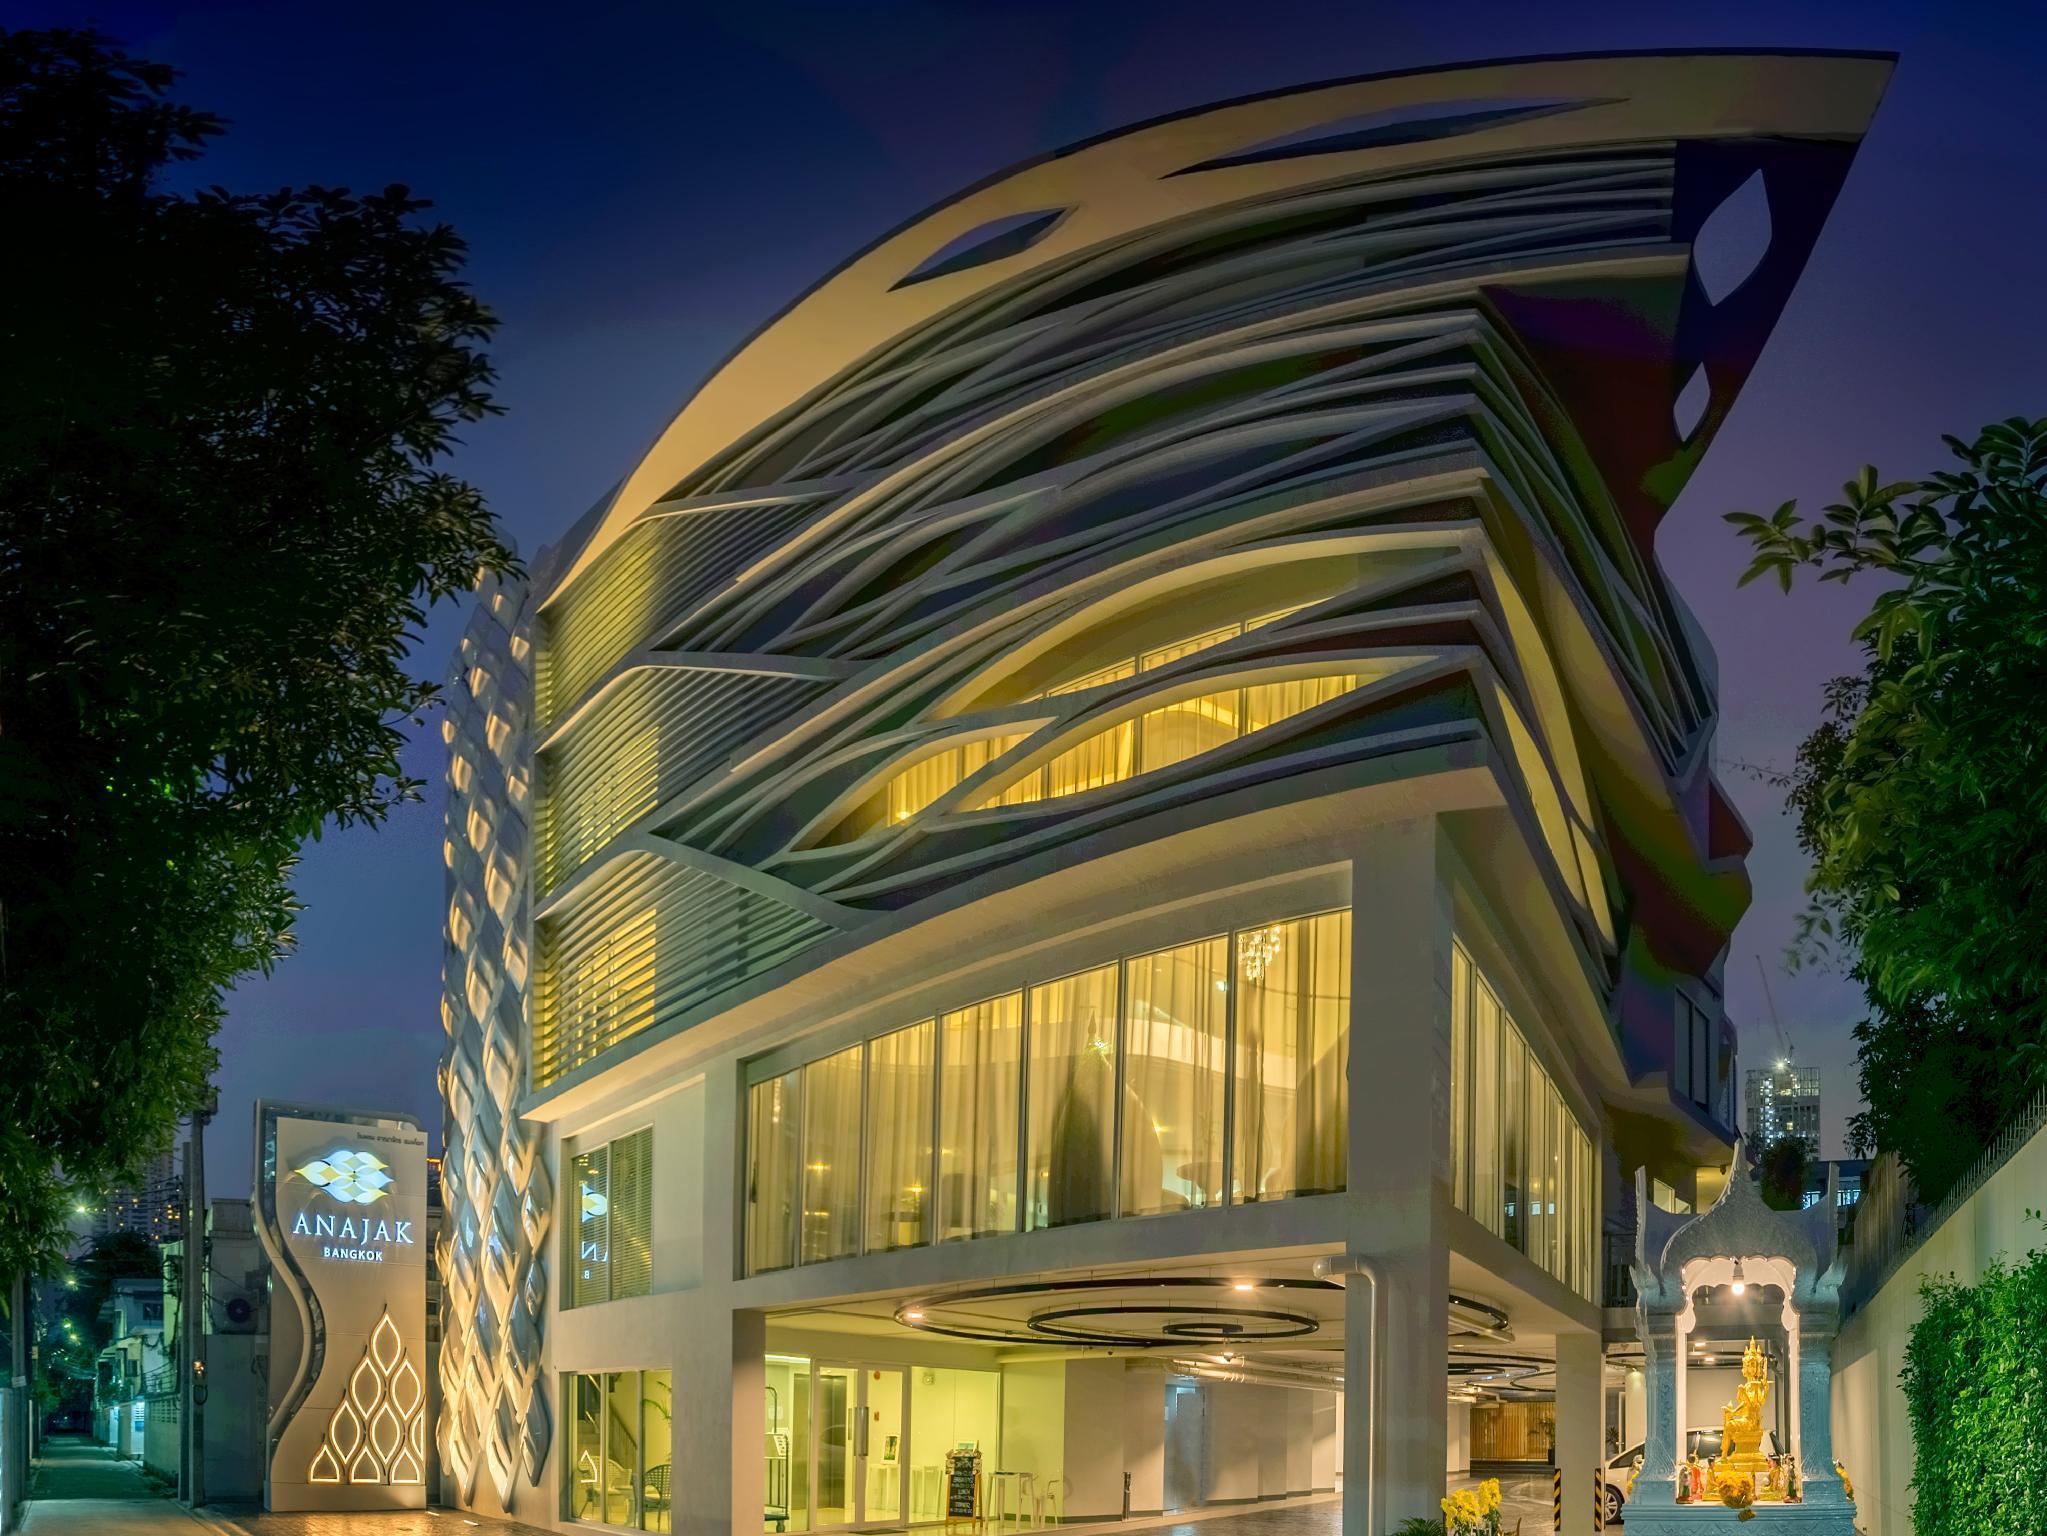 Anajak Bangkok Hotel Anajak Bangkok Hotel